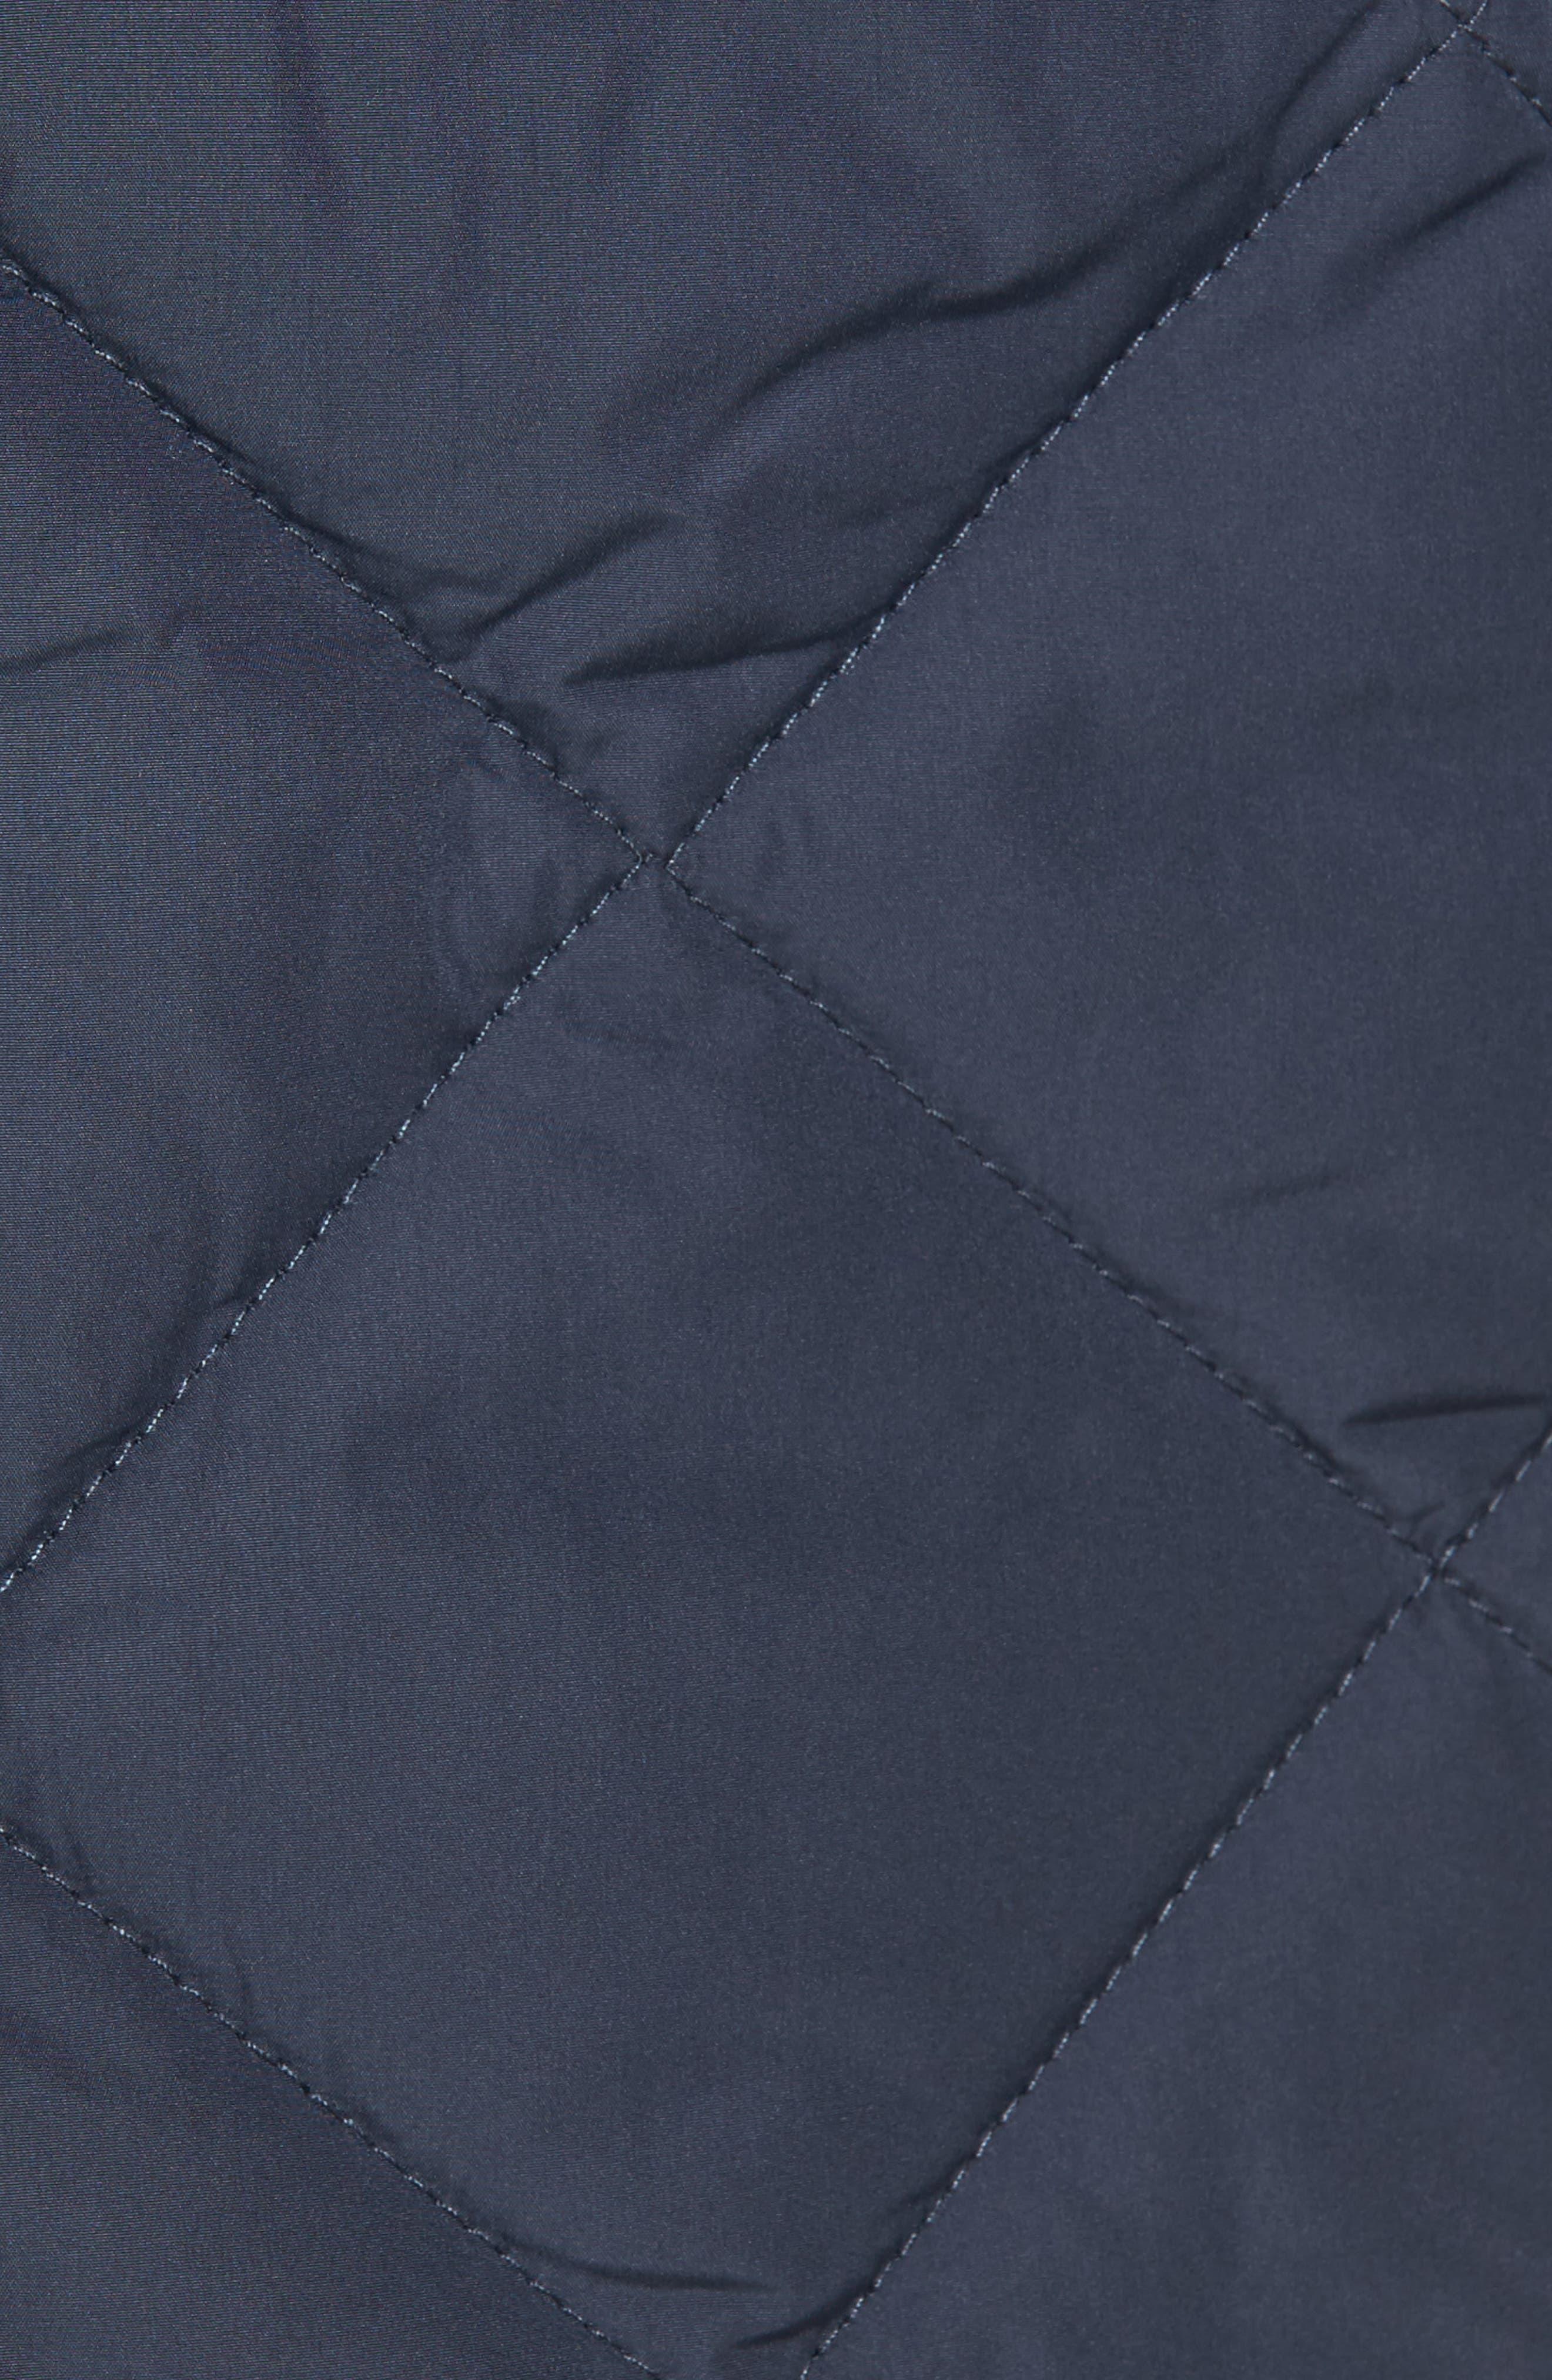 IIse Jacobsen Hornbaek Quilted Coat,                             Alternate thumbnail 6, color,                             401